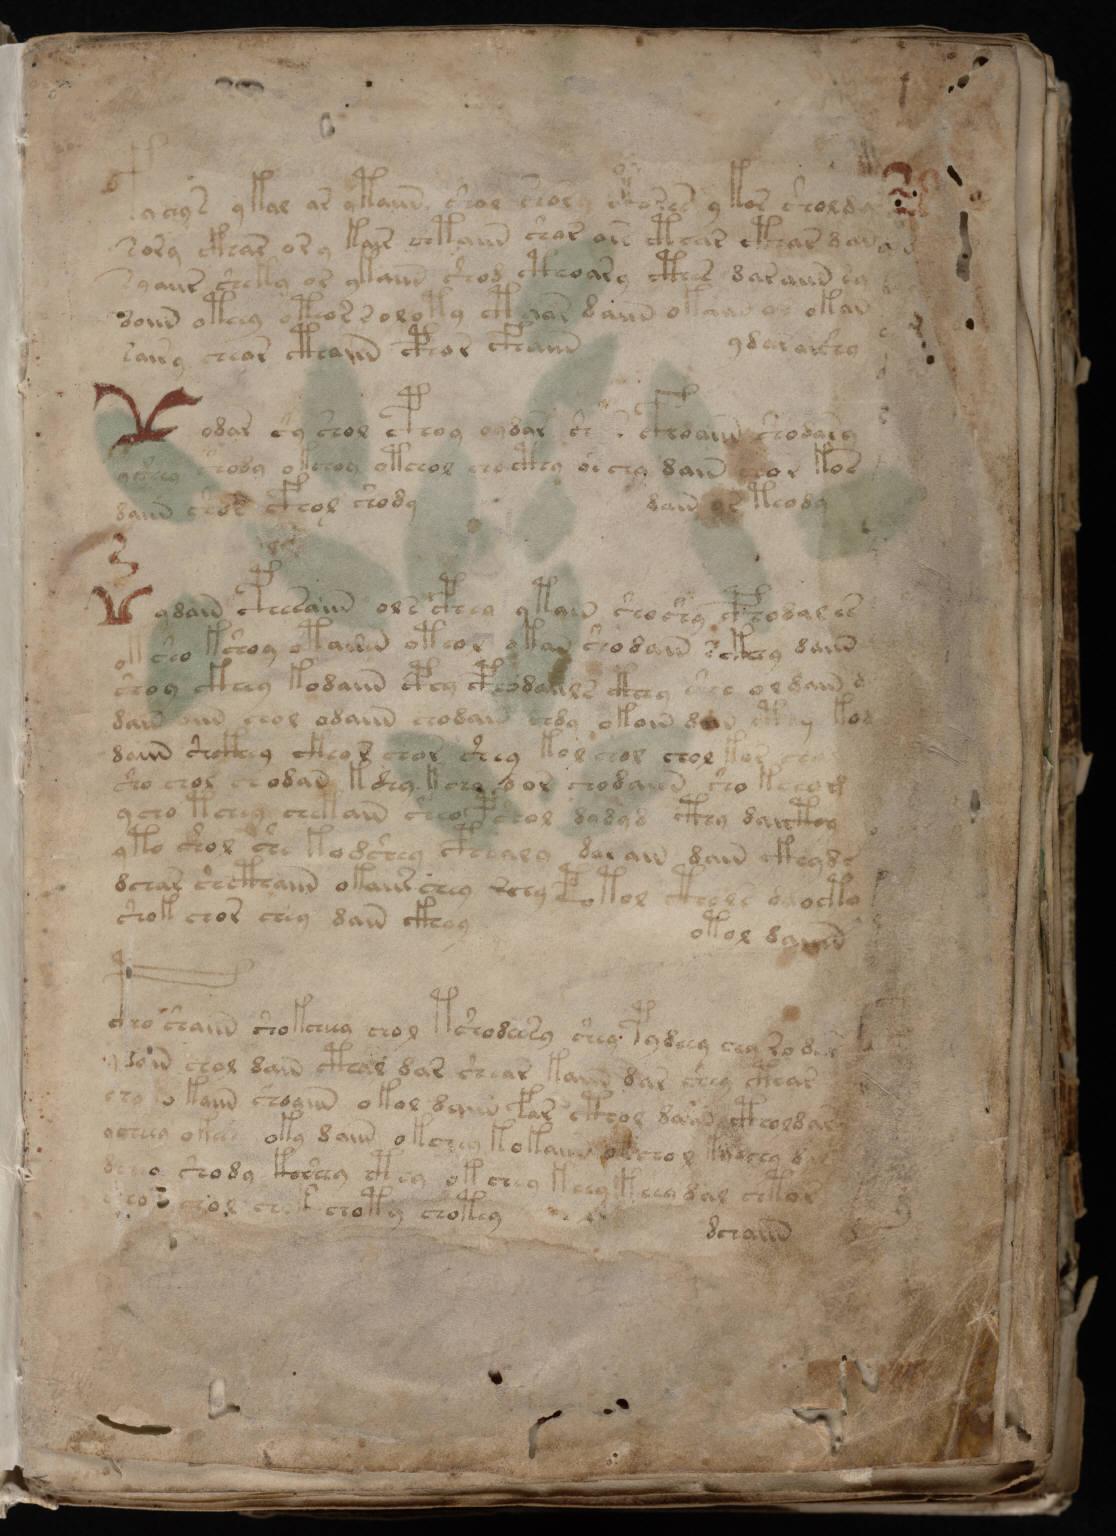 Скачать книгу орден манускрипта